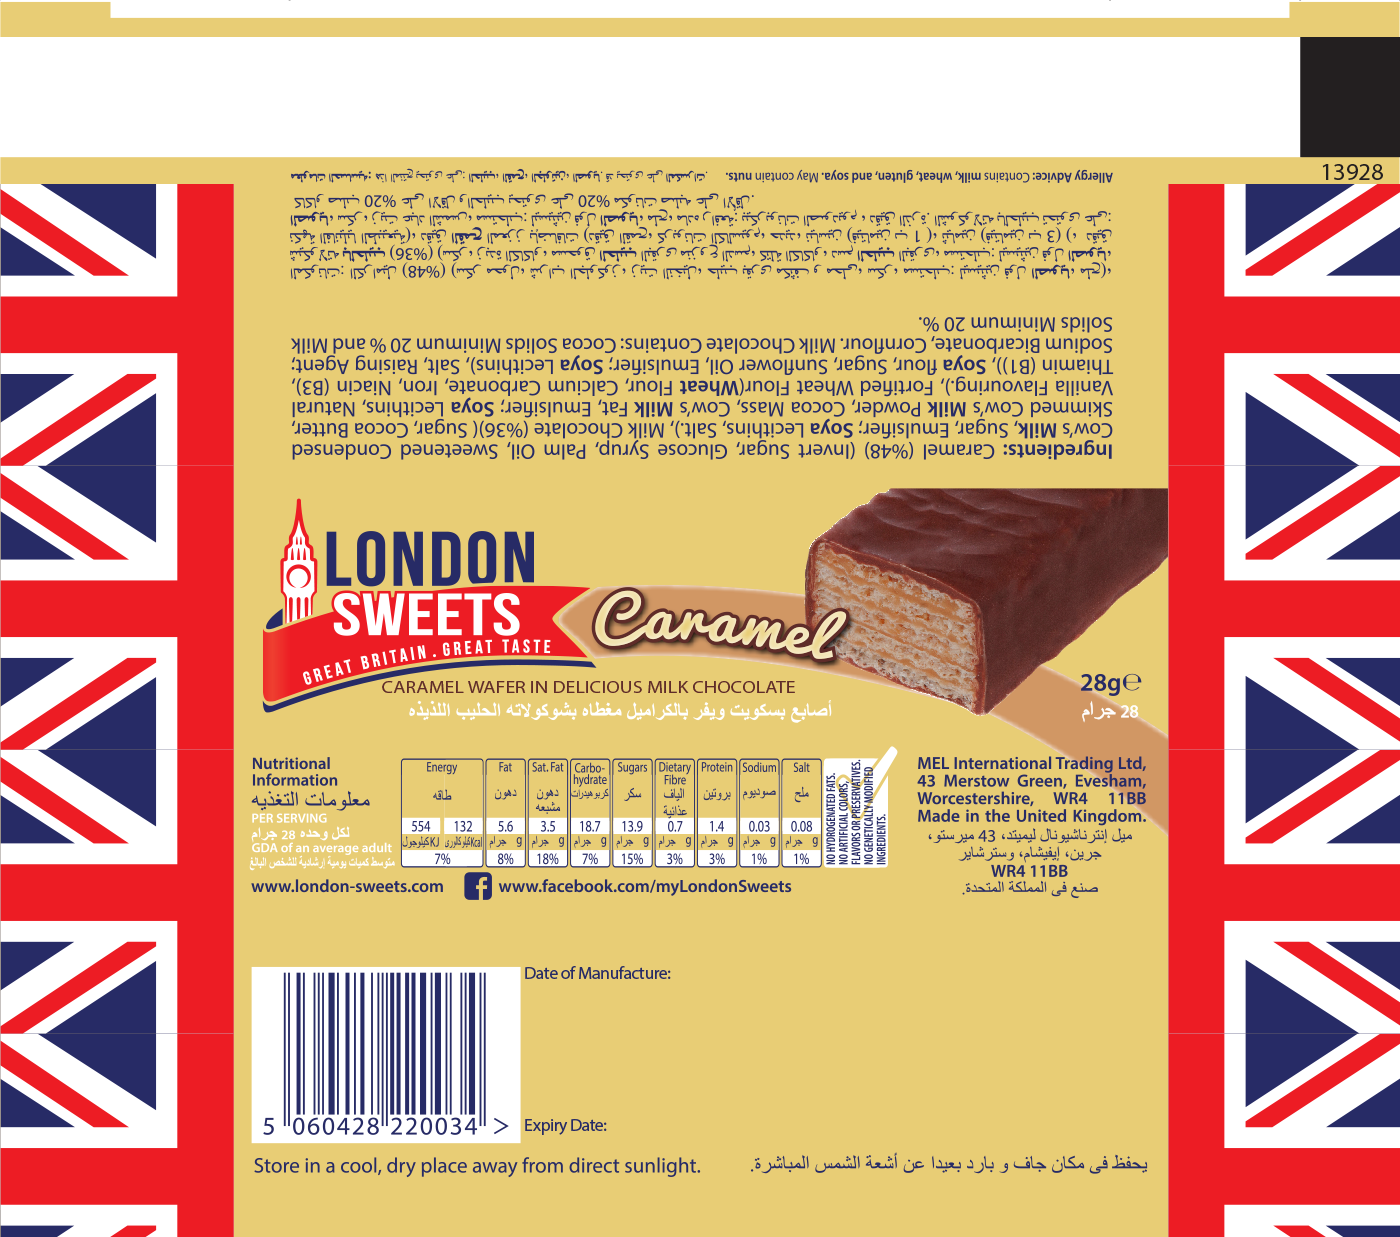 Caramel Wafer bar design.